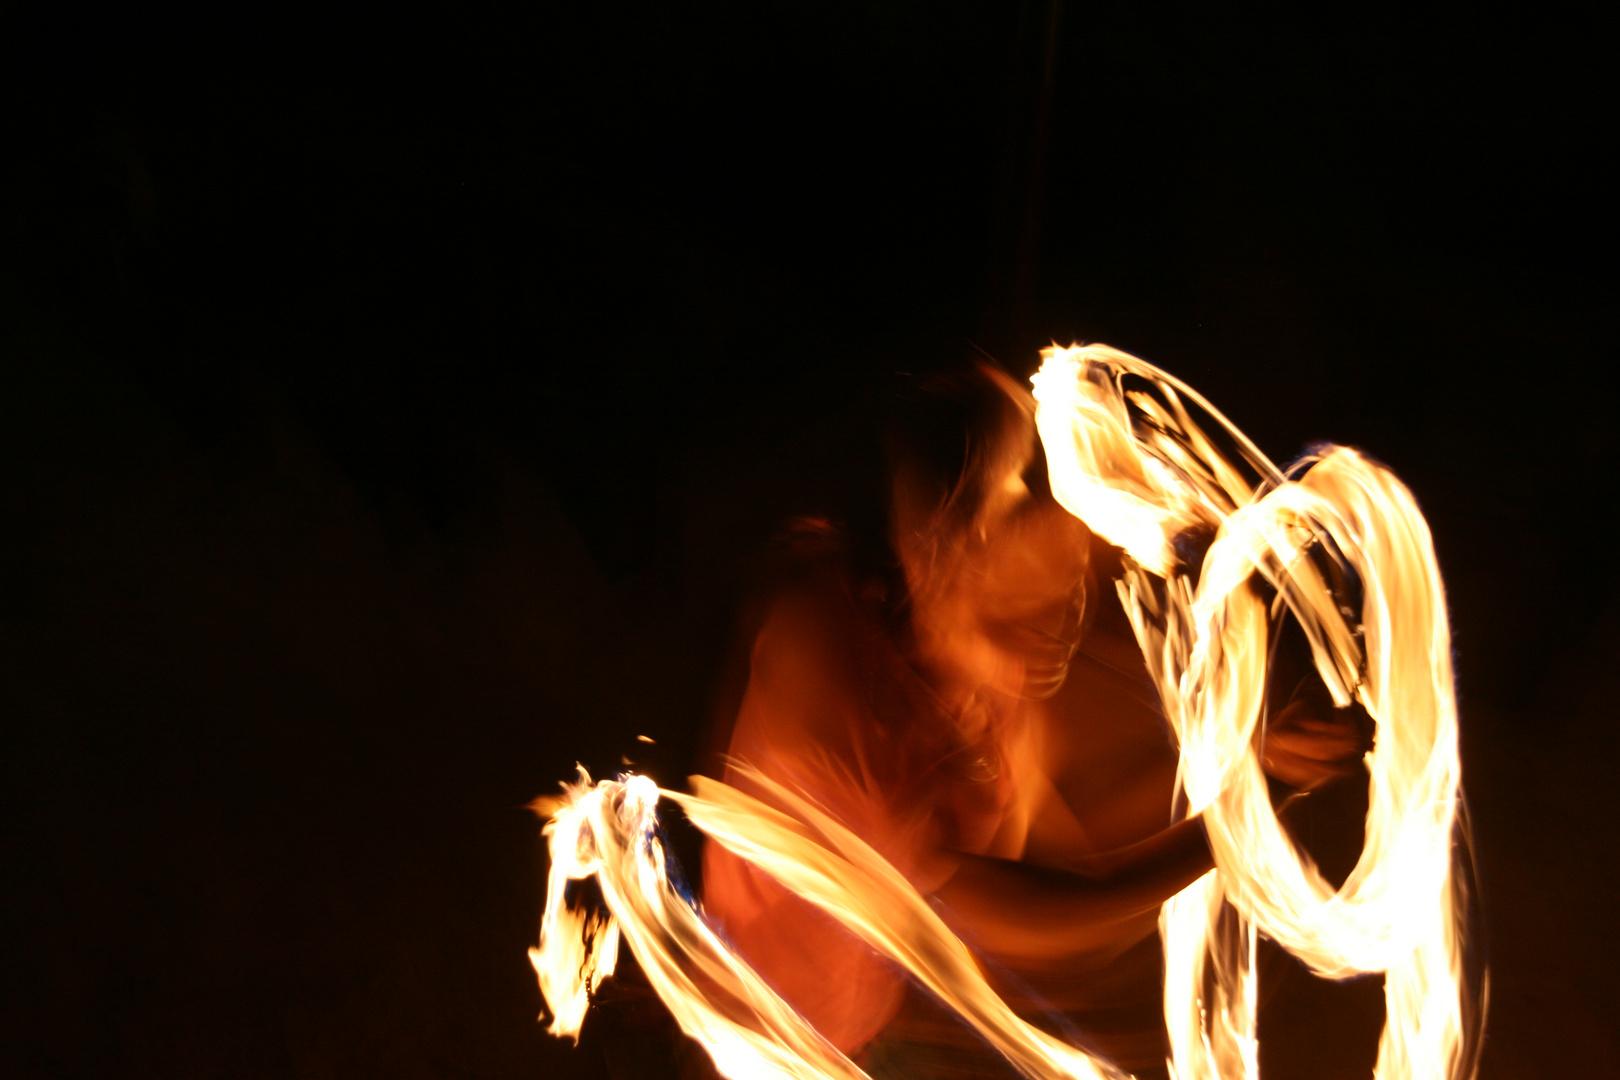 Dancing with fire II